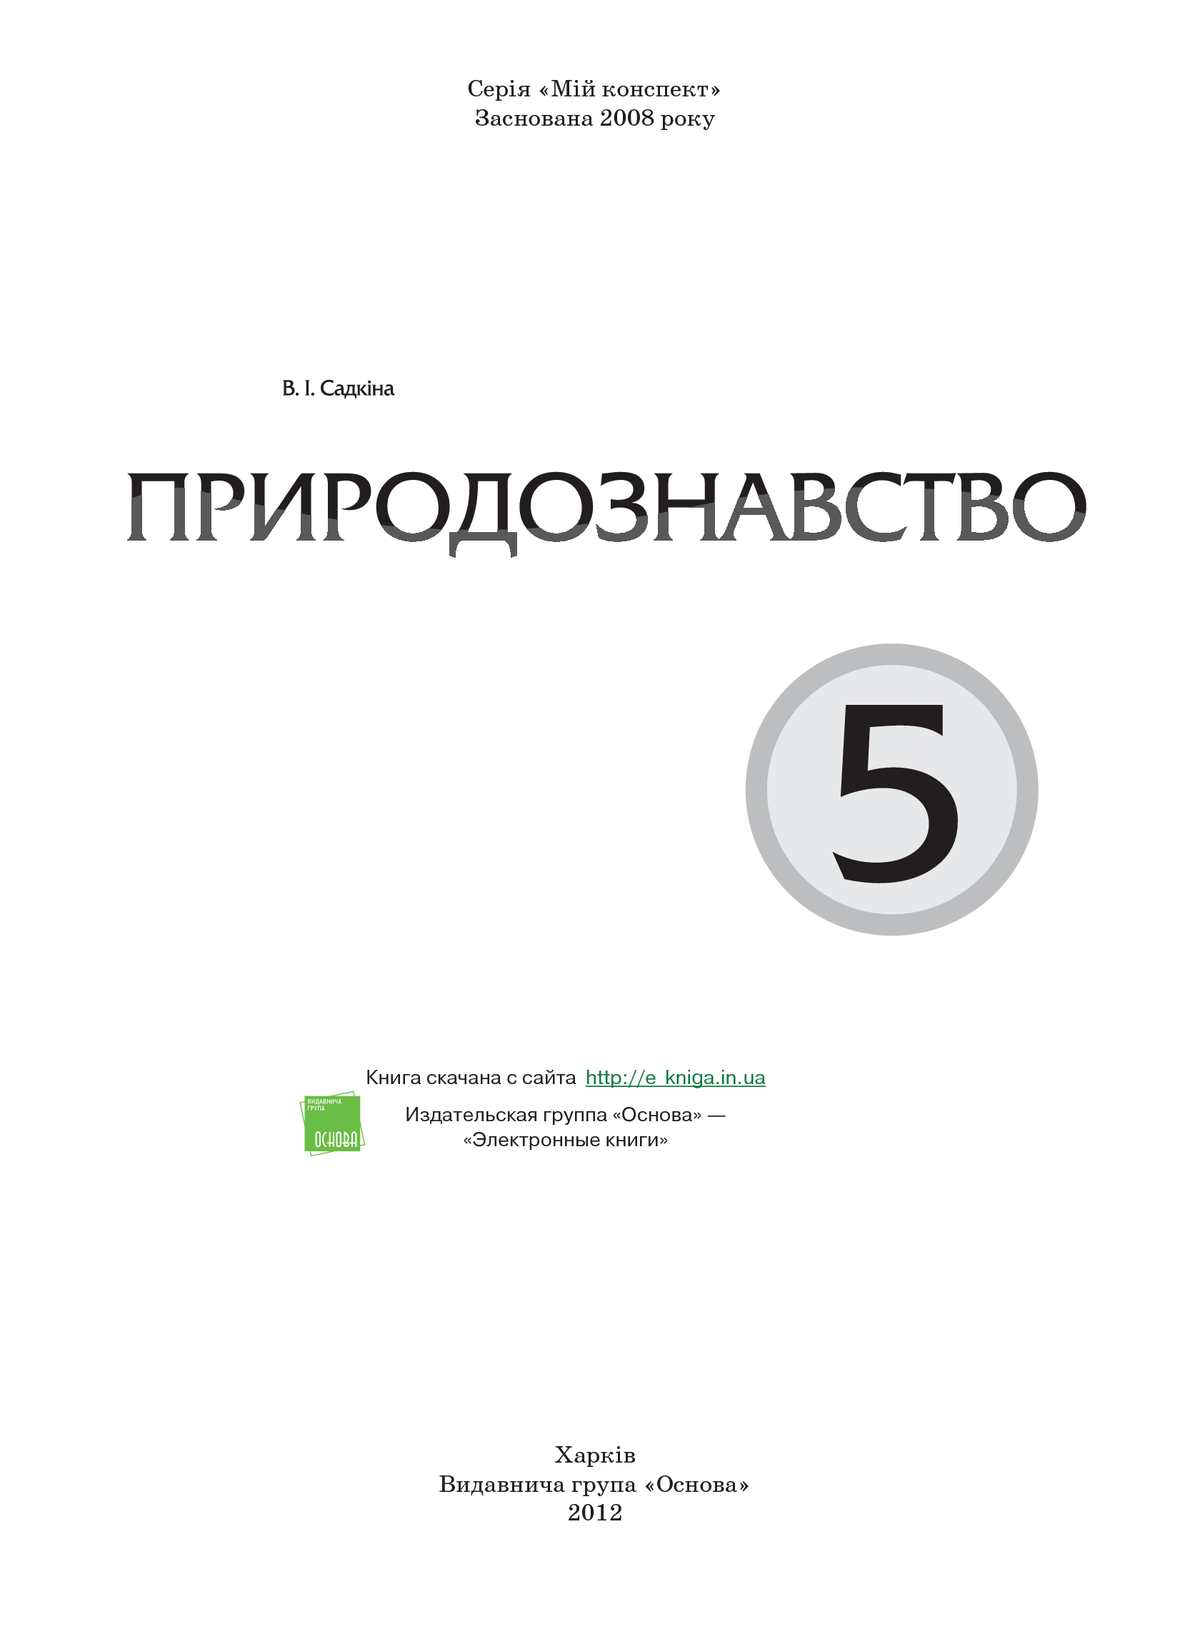 Calaméo - Sadkina V I Prirodoznavstvo 5 Klas 283523ddb6582